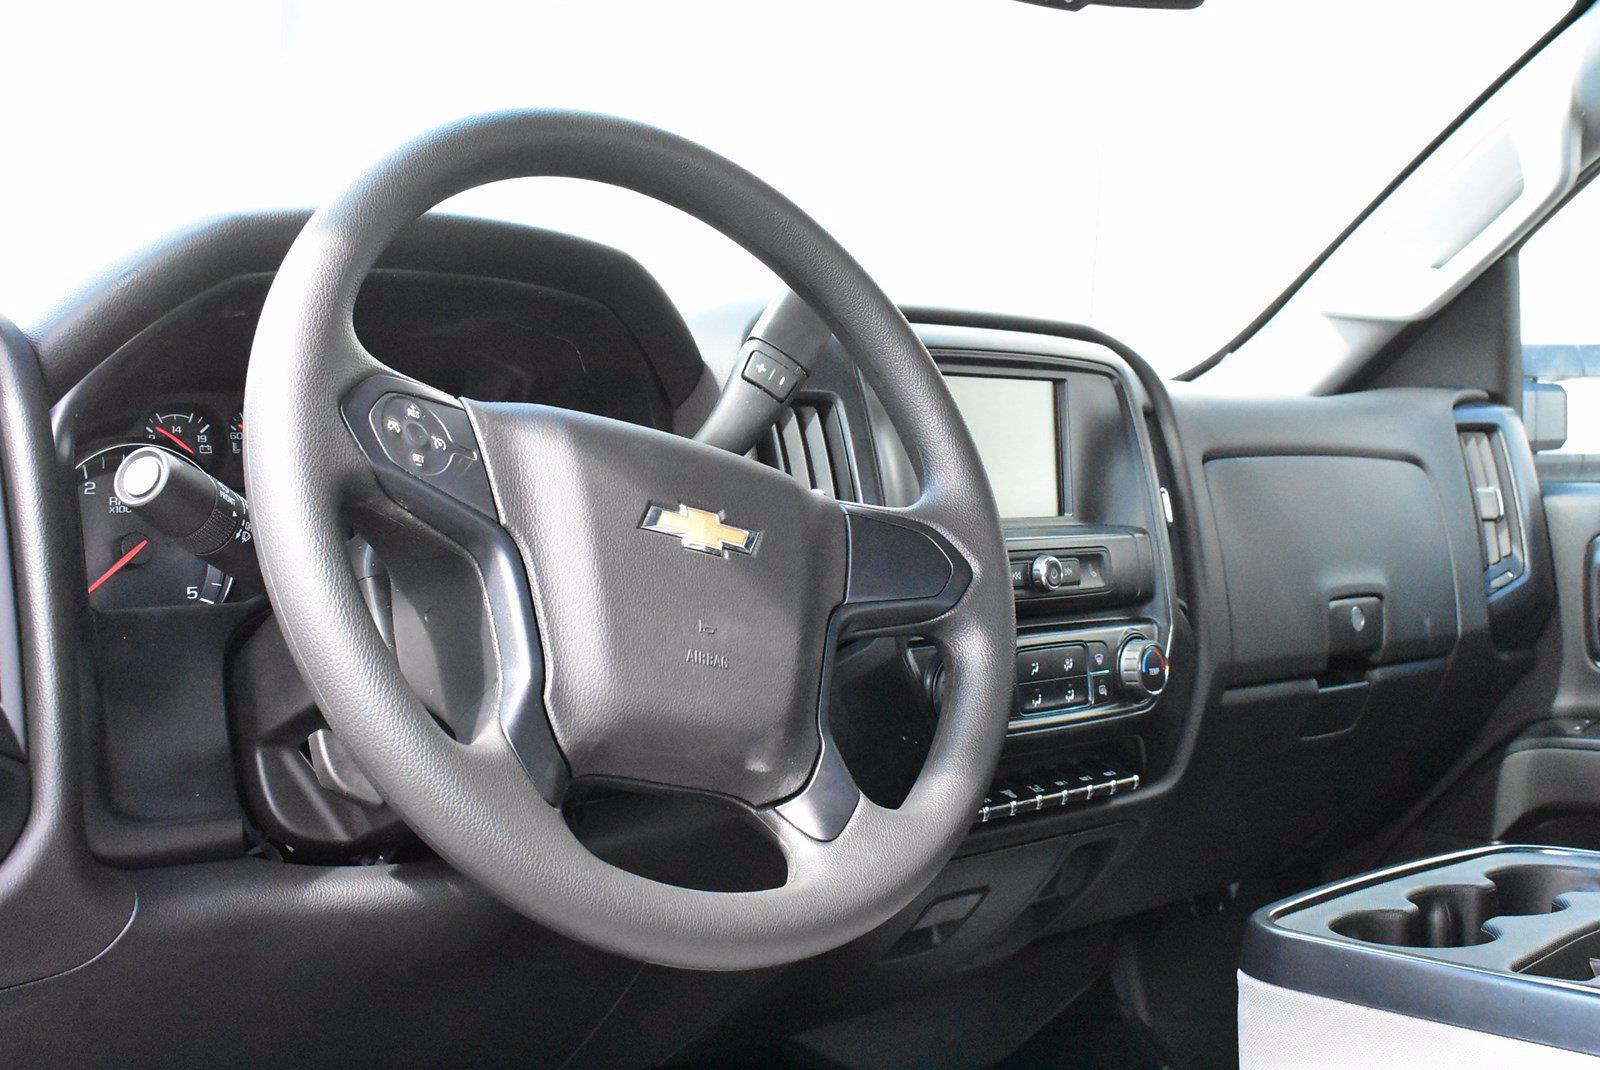 2020 Chevrolet Silverado 5500 DRW 4x2, Cab Chassis #D100326 - photo 4